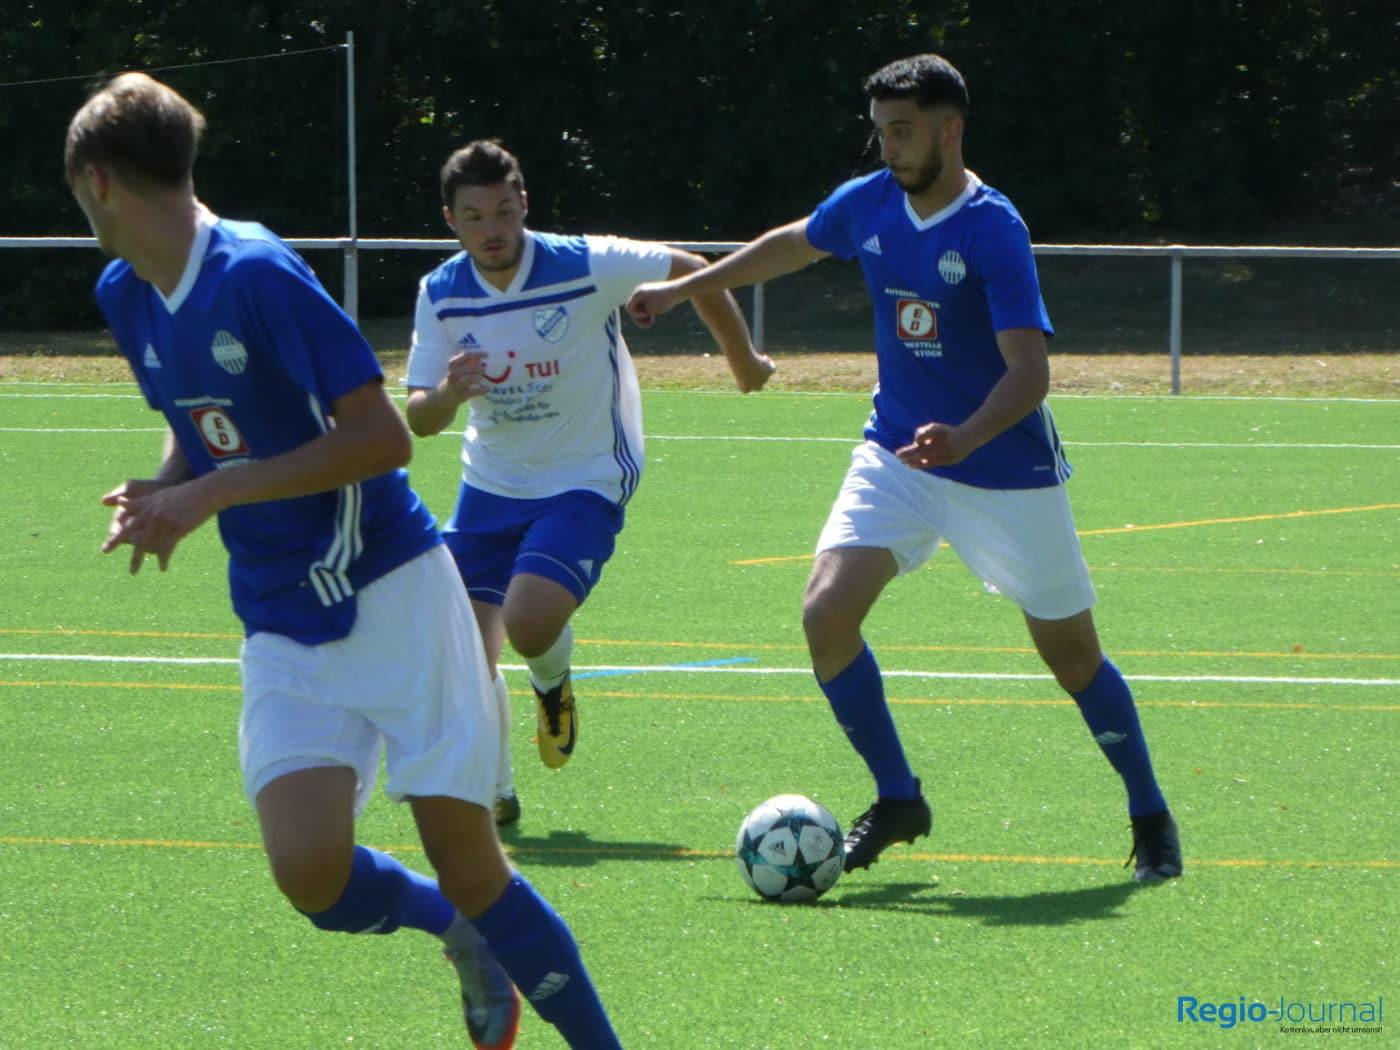 Verbandsliga: Hellas 05 Bildstock - FC Palatia Limbach